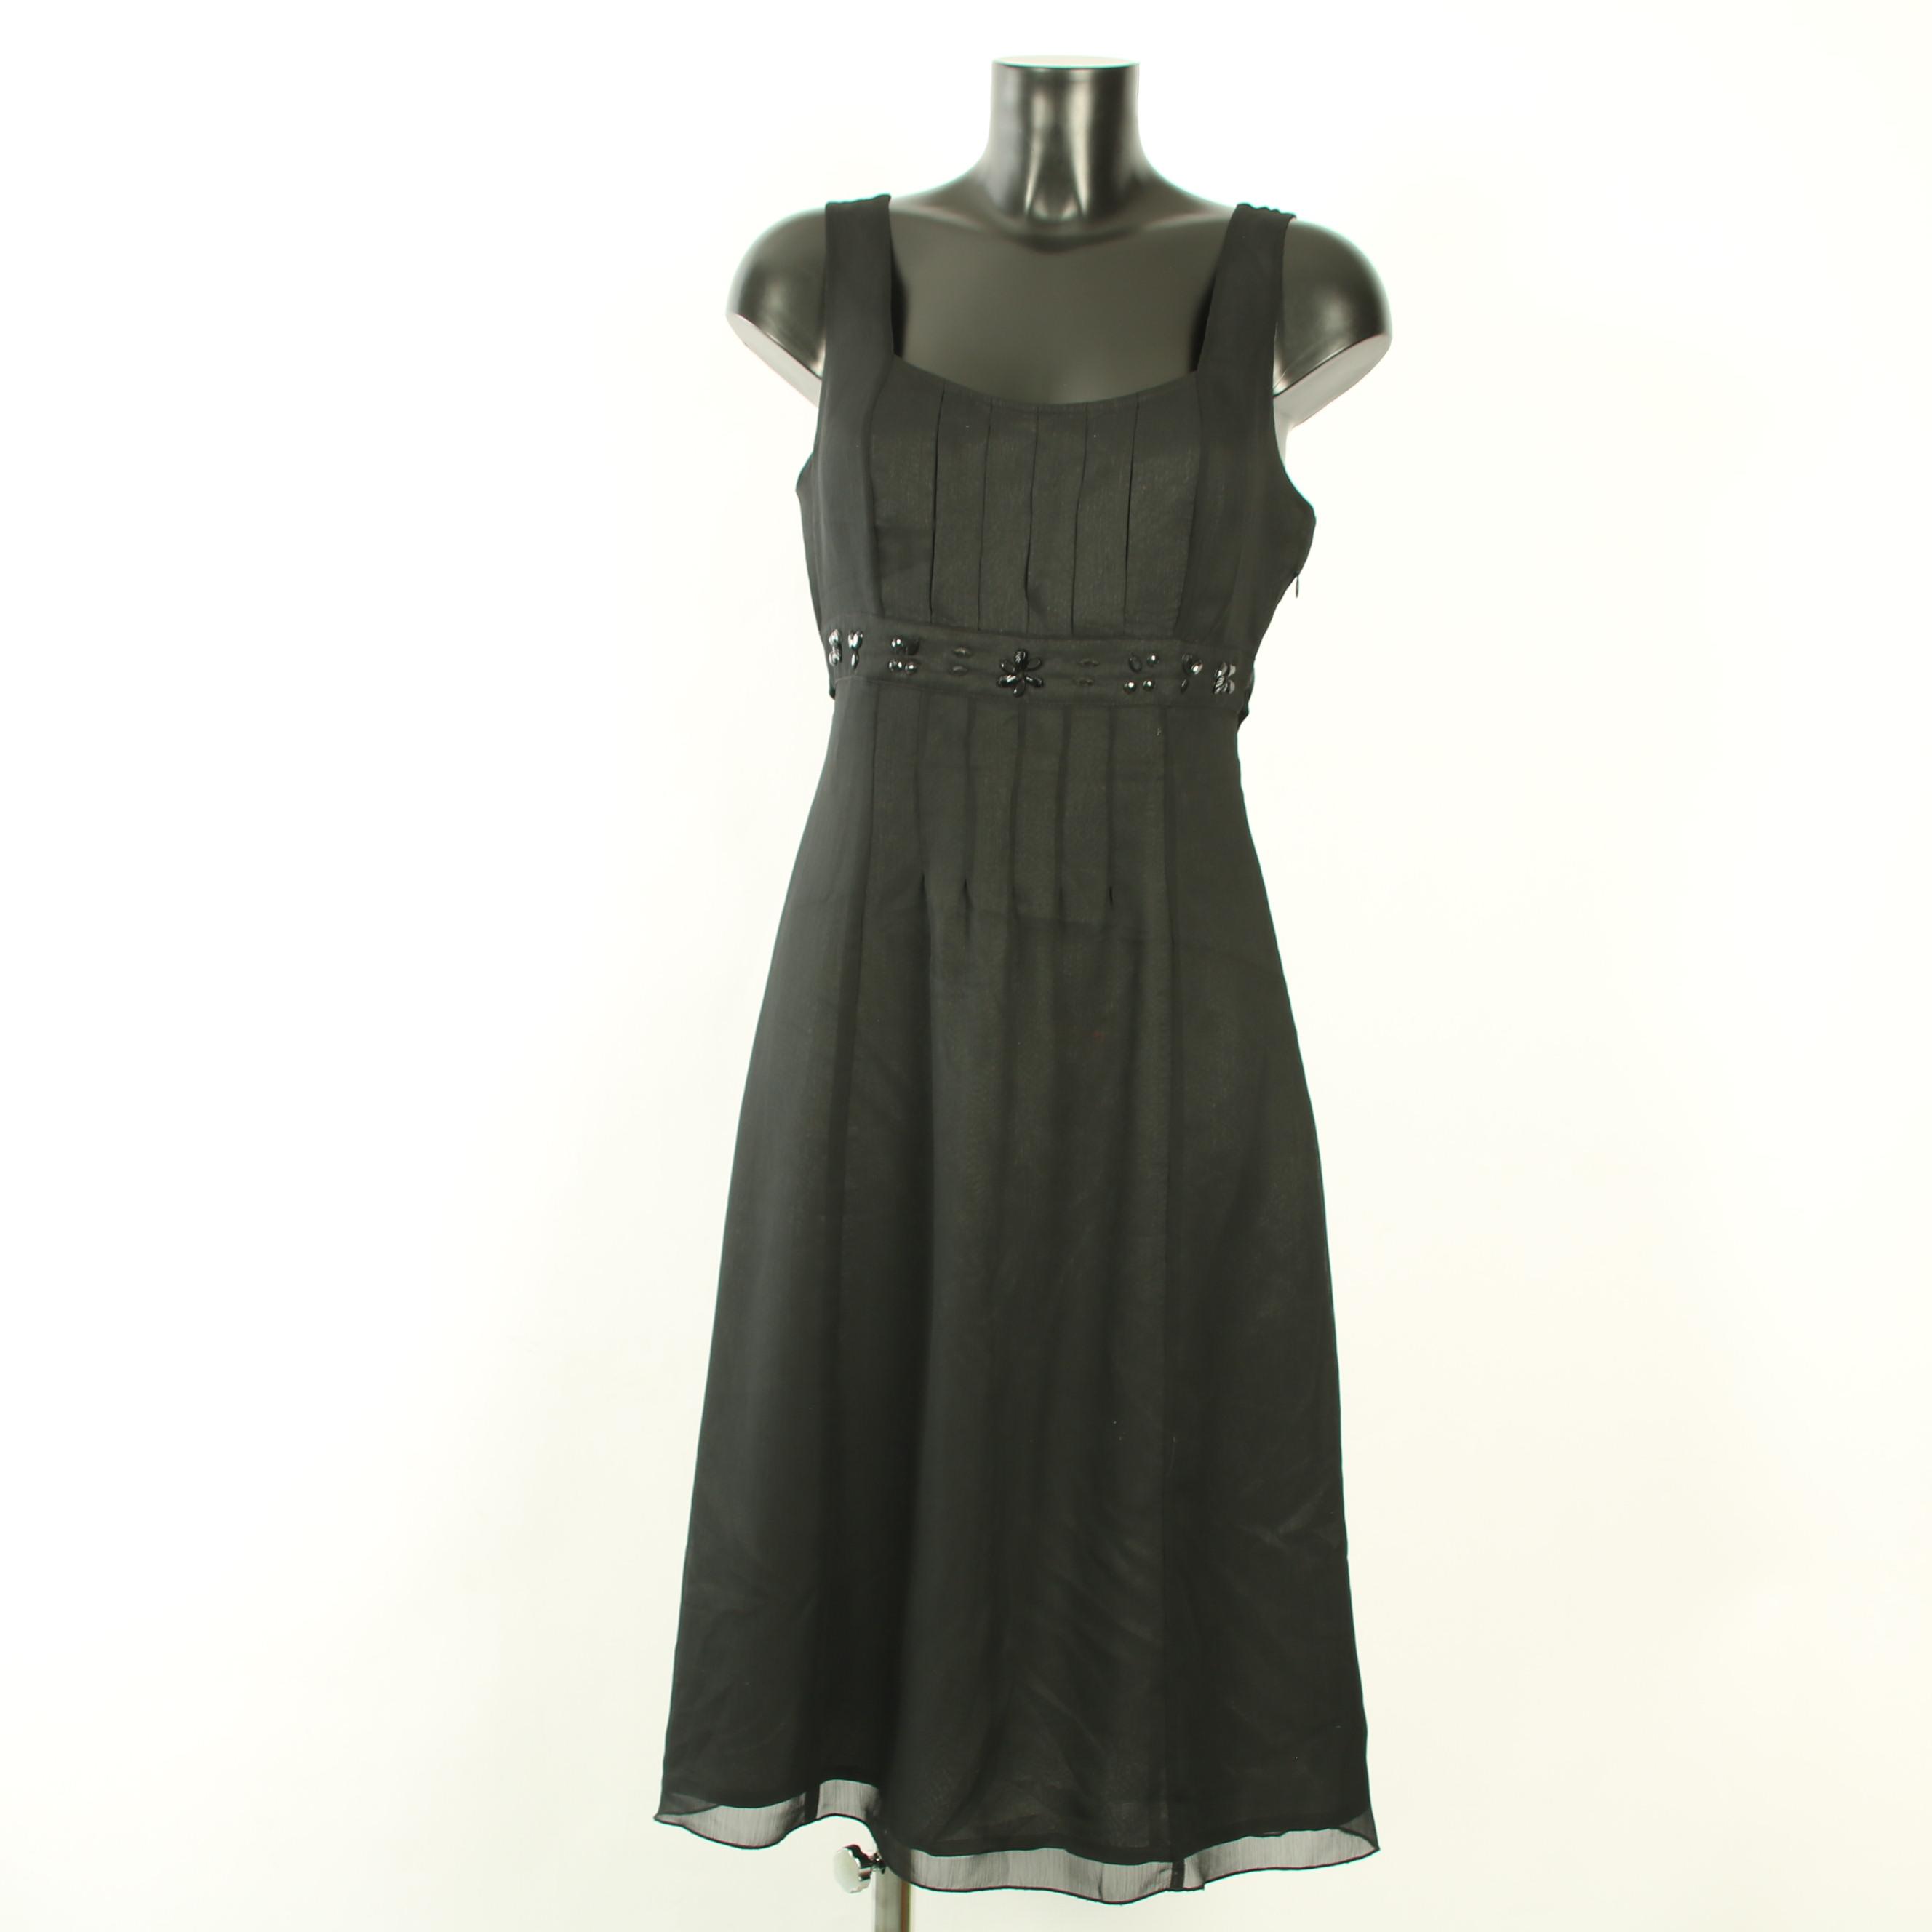 fa1f1747dda7 Mexx svart klänning 40 - Secondhand.se